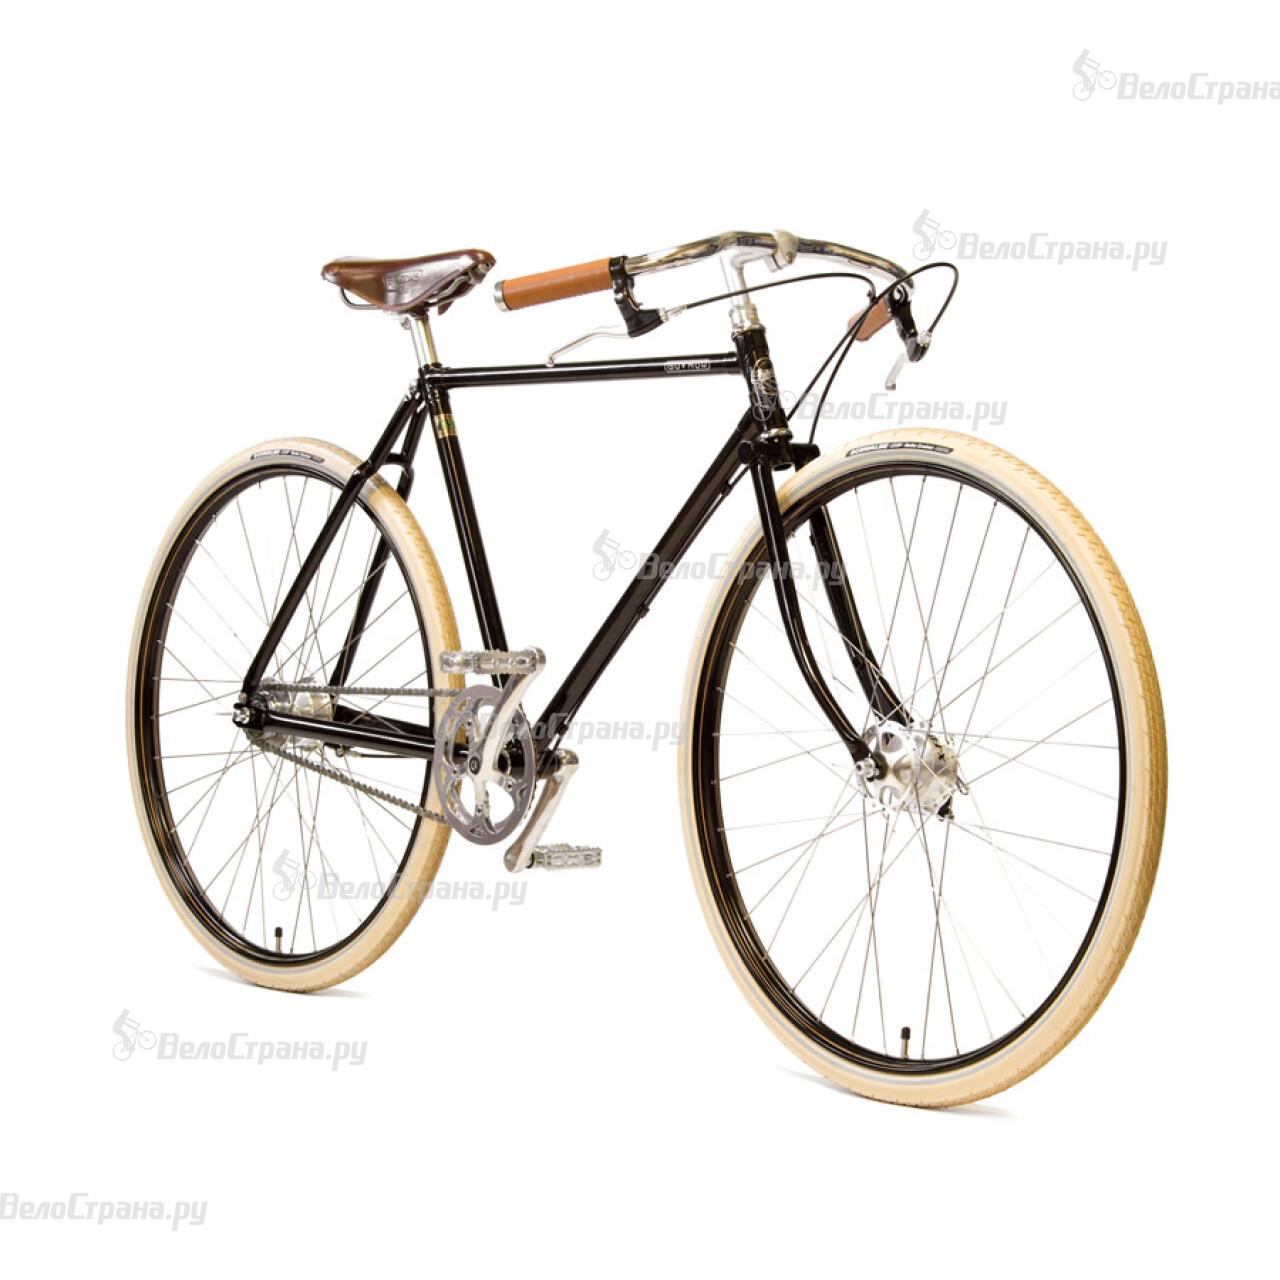 Велосипед Electra Guvnor 3 Speed (2017)